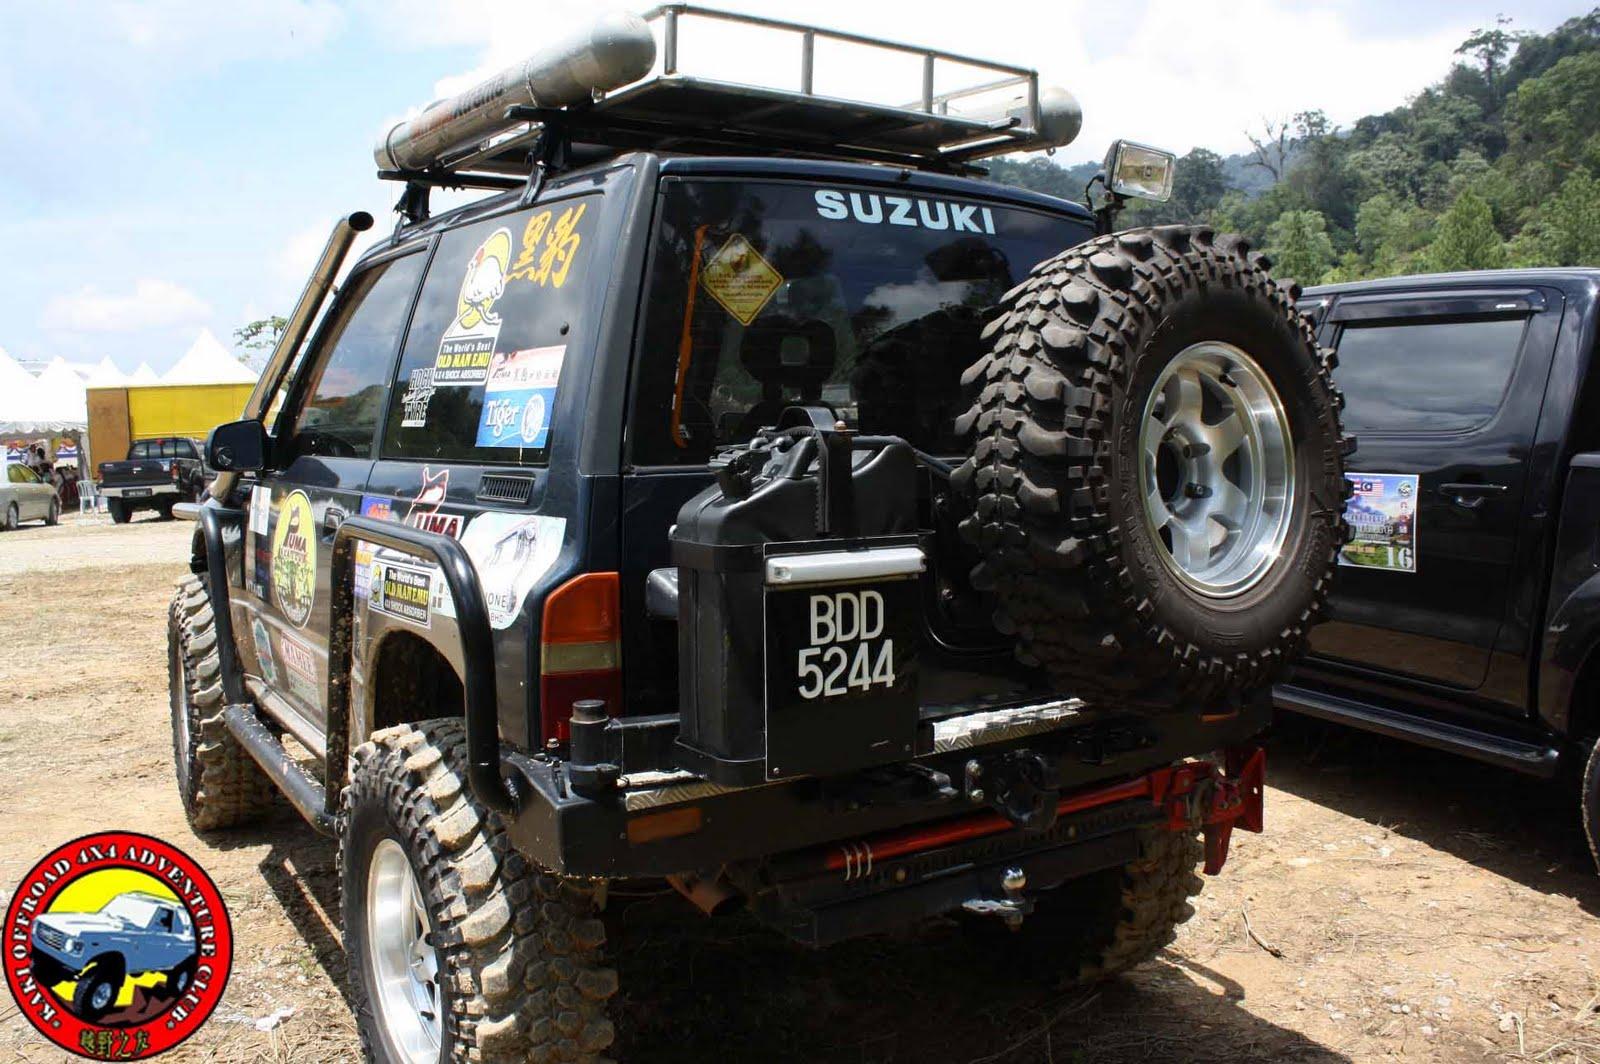 Kaki Offroad 4x4 Adventure Club Suzuki Vitara Modification